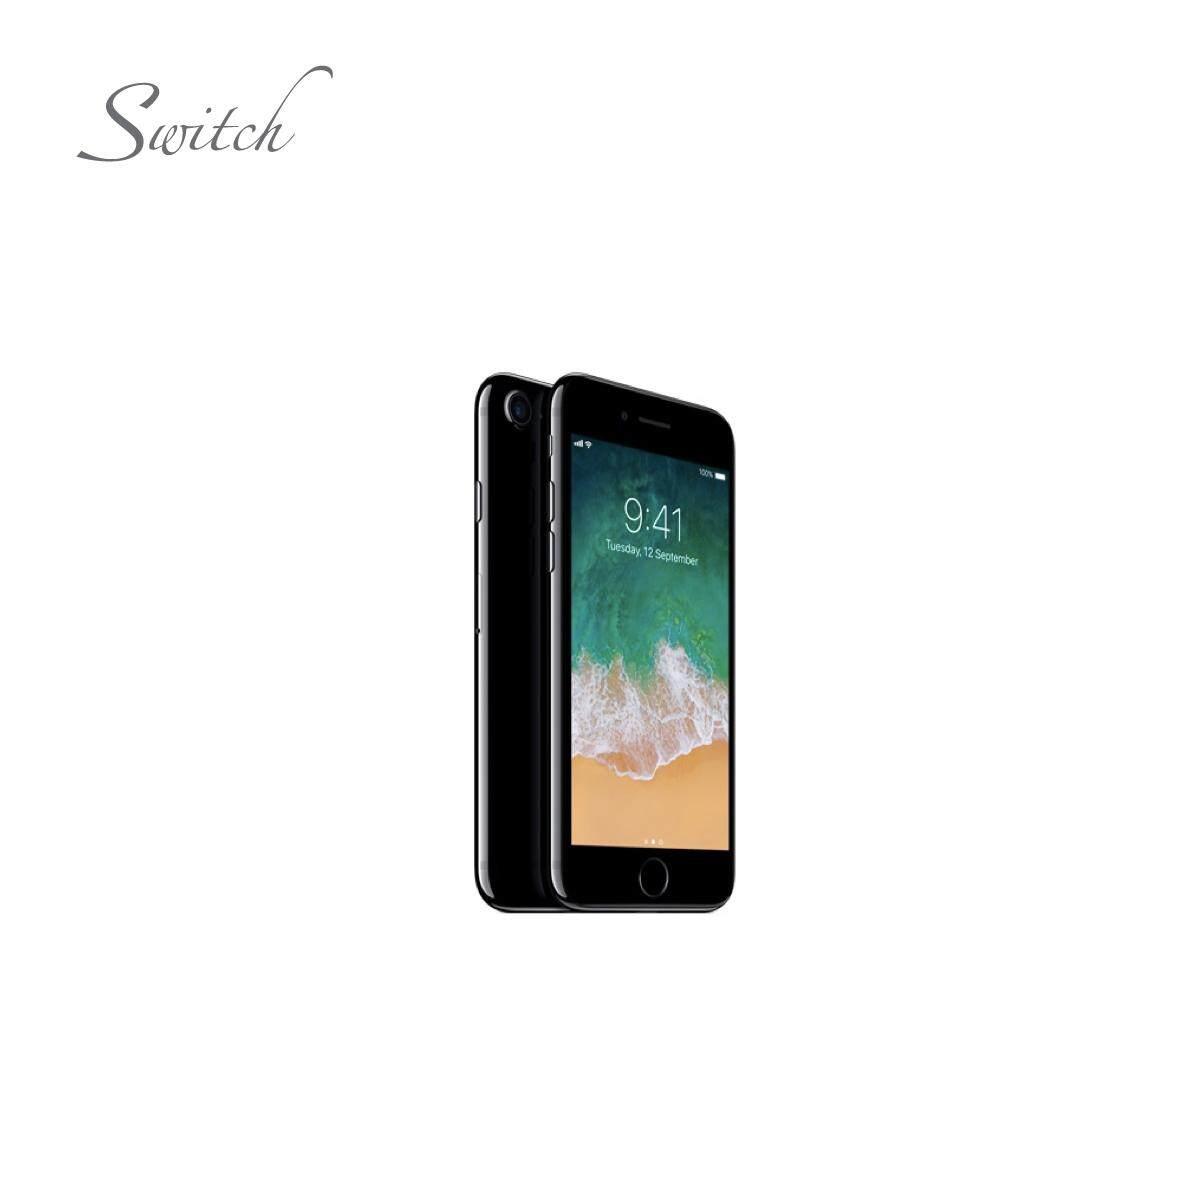 Daftar Harga Apple Iphone 6s 64 Gb Smartphone Grey Termurah 2018 Fujixerox Dpm225dw Great Sales On Mobiles Tablets Lazada Malaysia 7